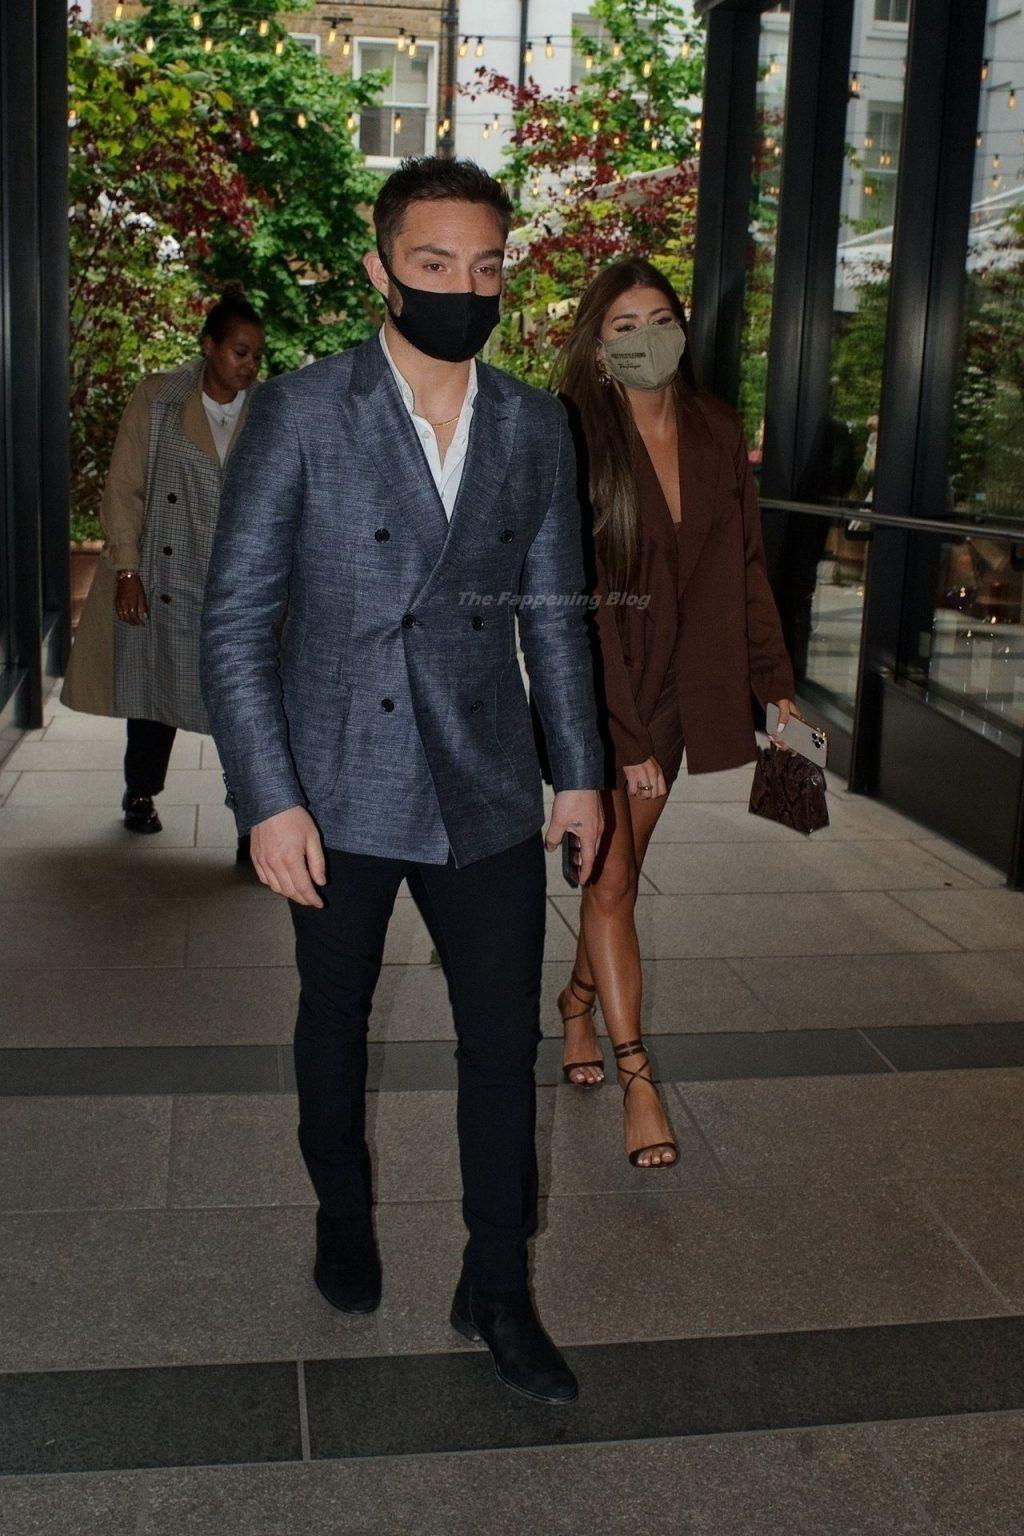 Tamara Francesconi & Ed Westwick are Looking Sharp in London (10 Photos)